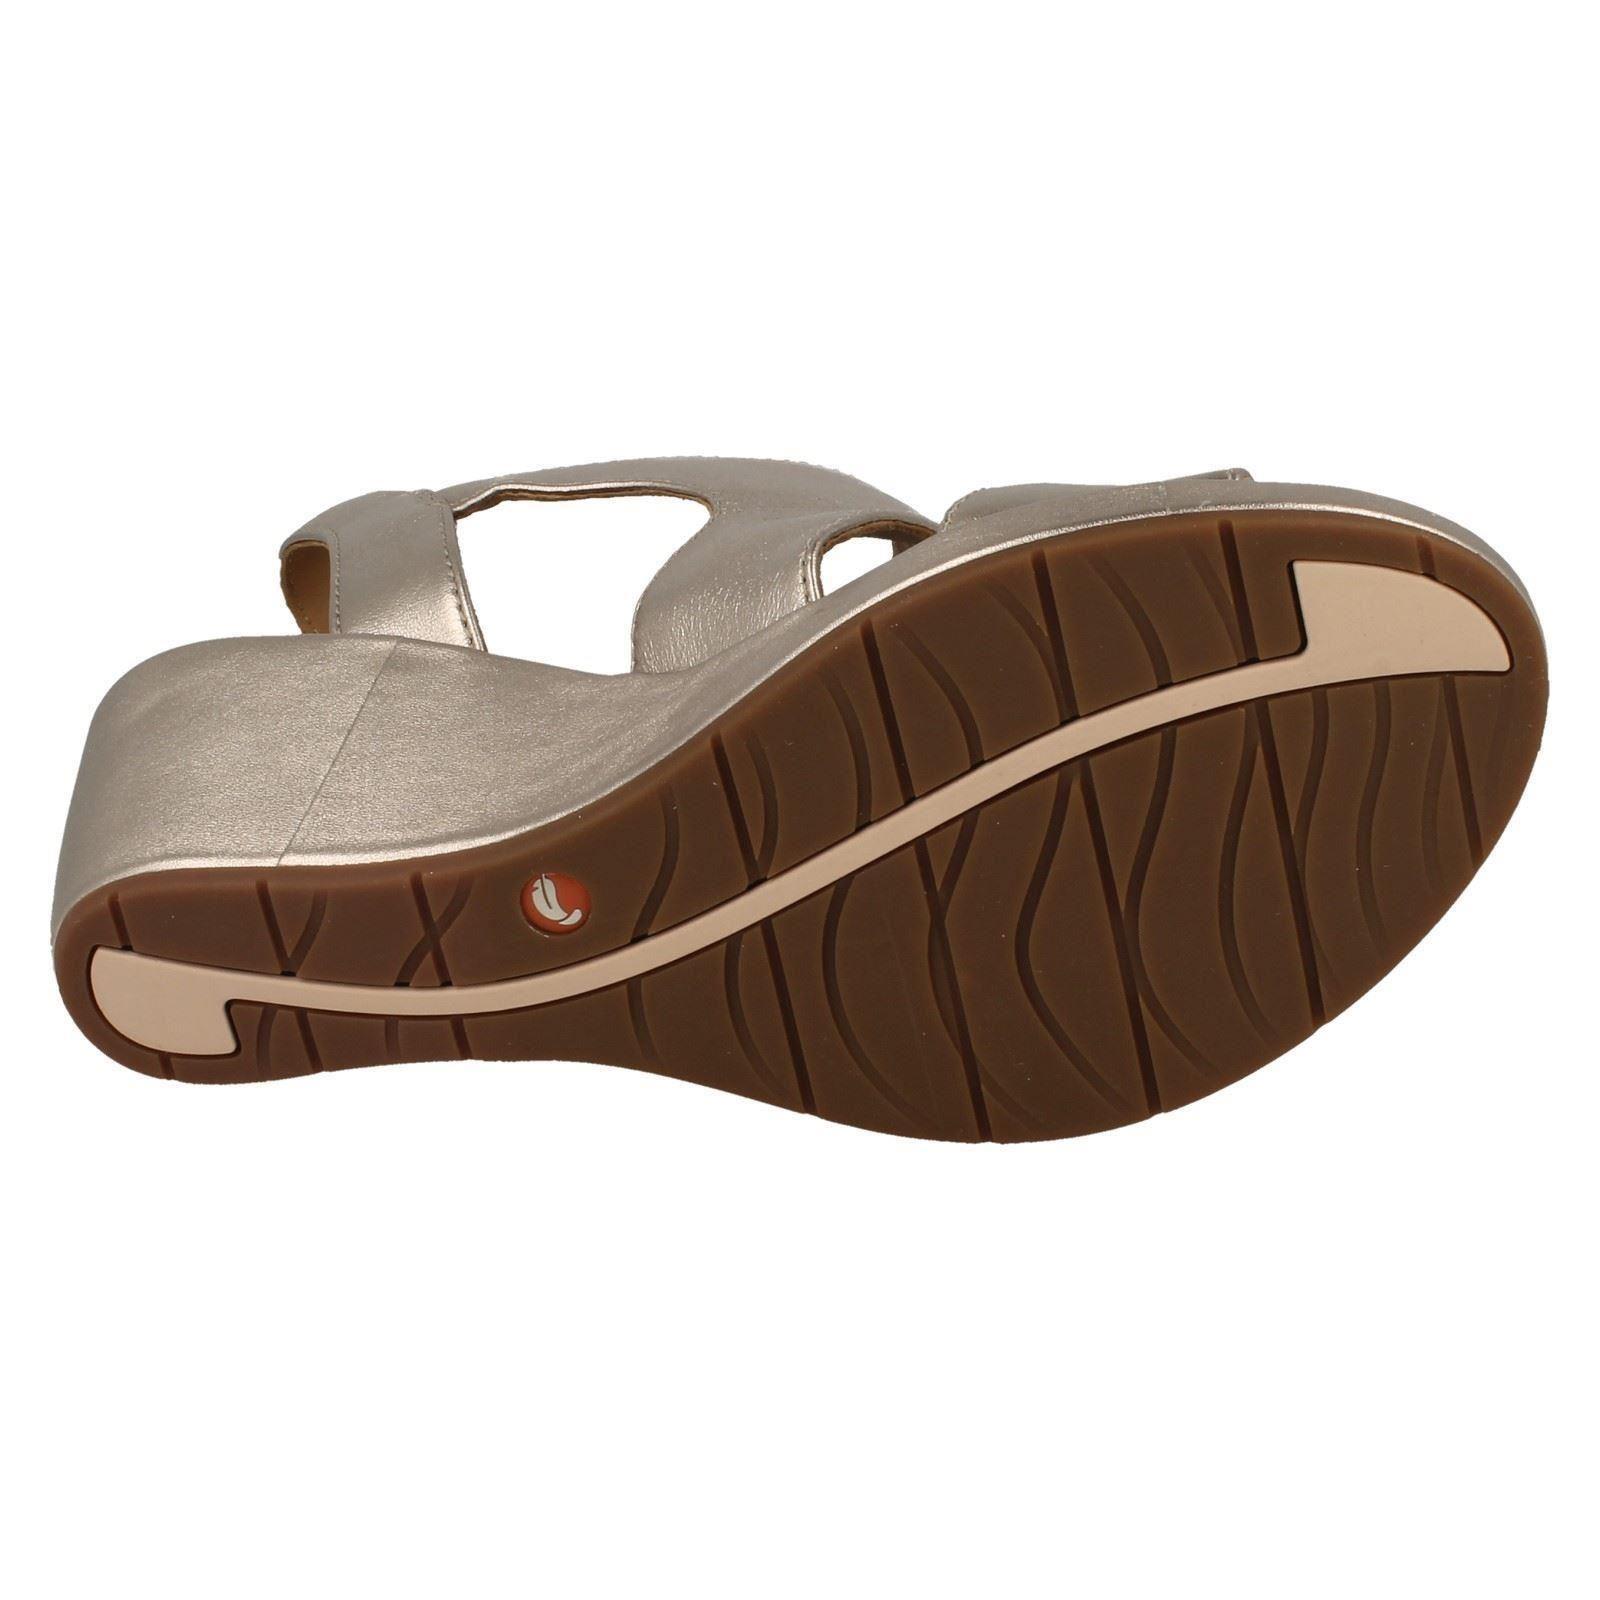 Ladies Clarks Sling Back Wedge Heeled Sandals /'Un Plaza Sling/'